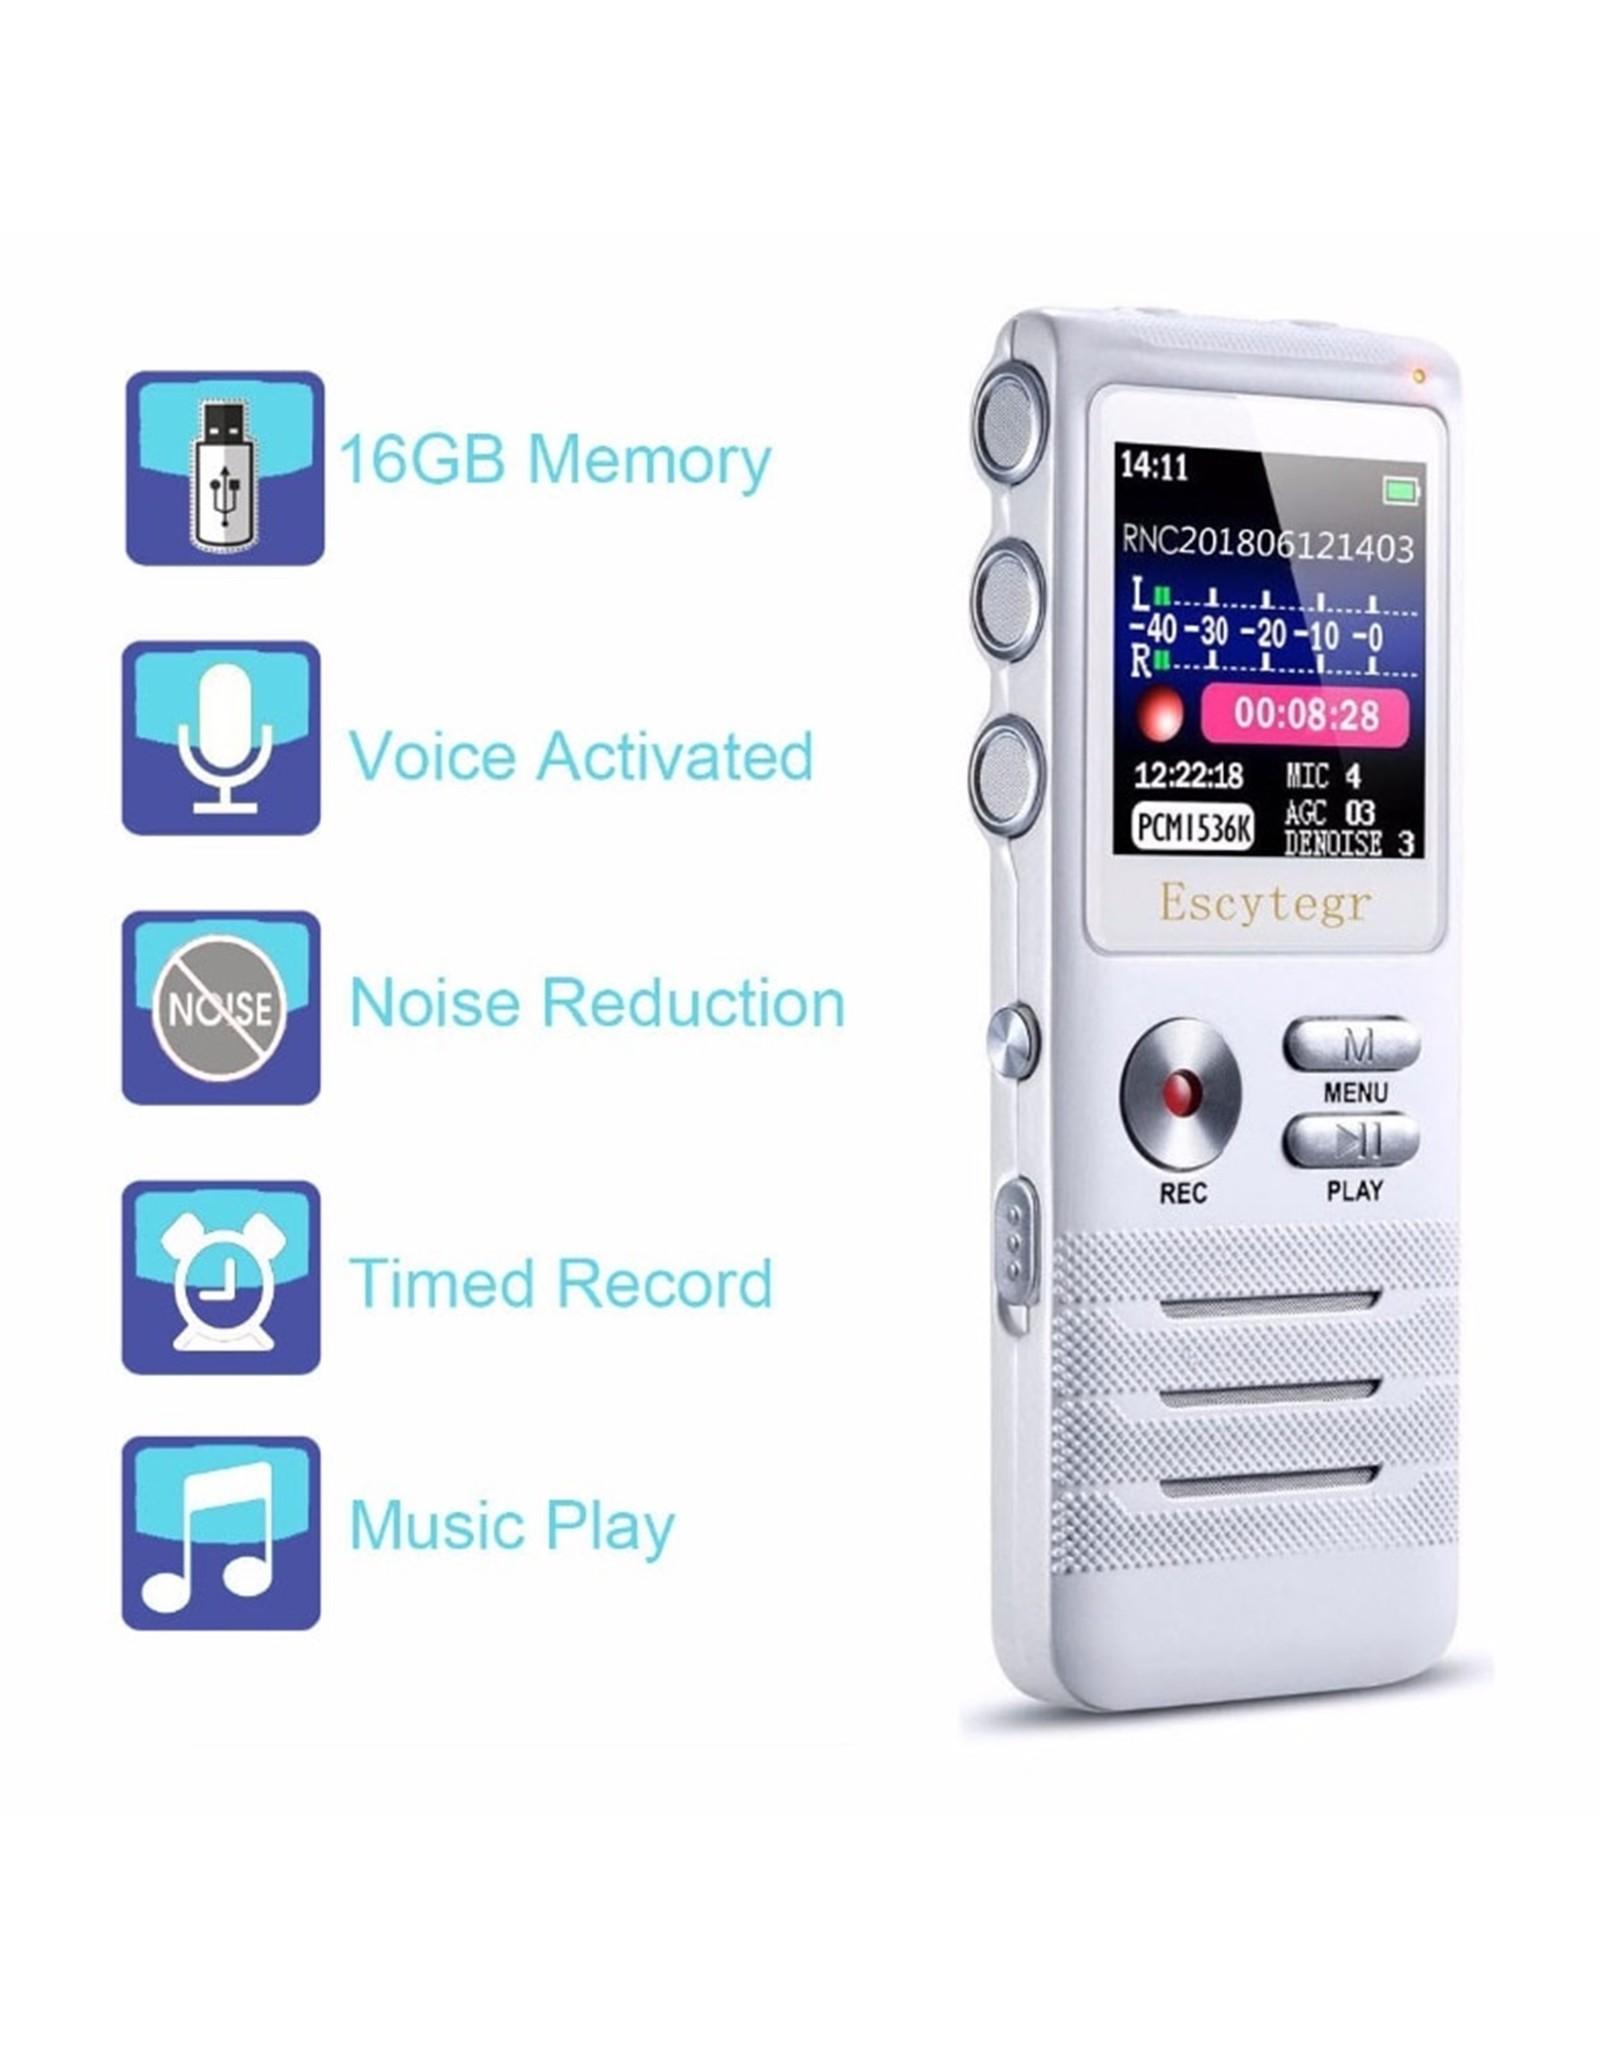 Premium Digitale Recorder - Premium Voice Recorder - Multifunctionele Voice Recorder - Dictafoon 16 GB - Audio Memo Recorder Met USB - Spraak Recorder - Sound – Geluid Recorder - Opname Apparaat - Met MP3 Speler Functie – 16GB